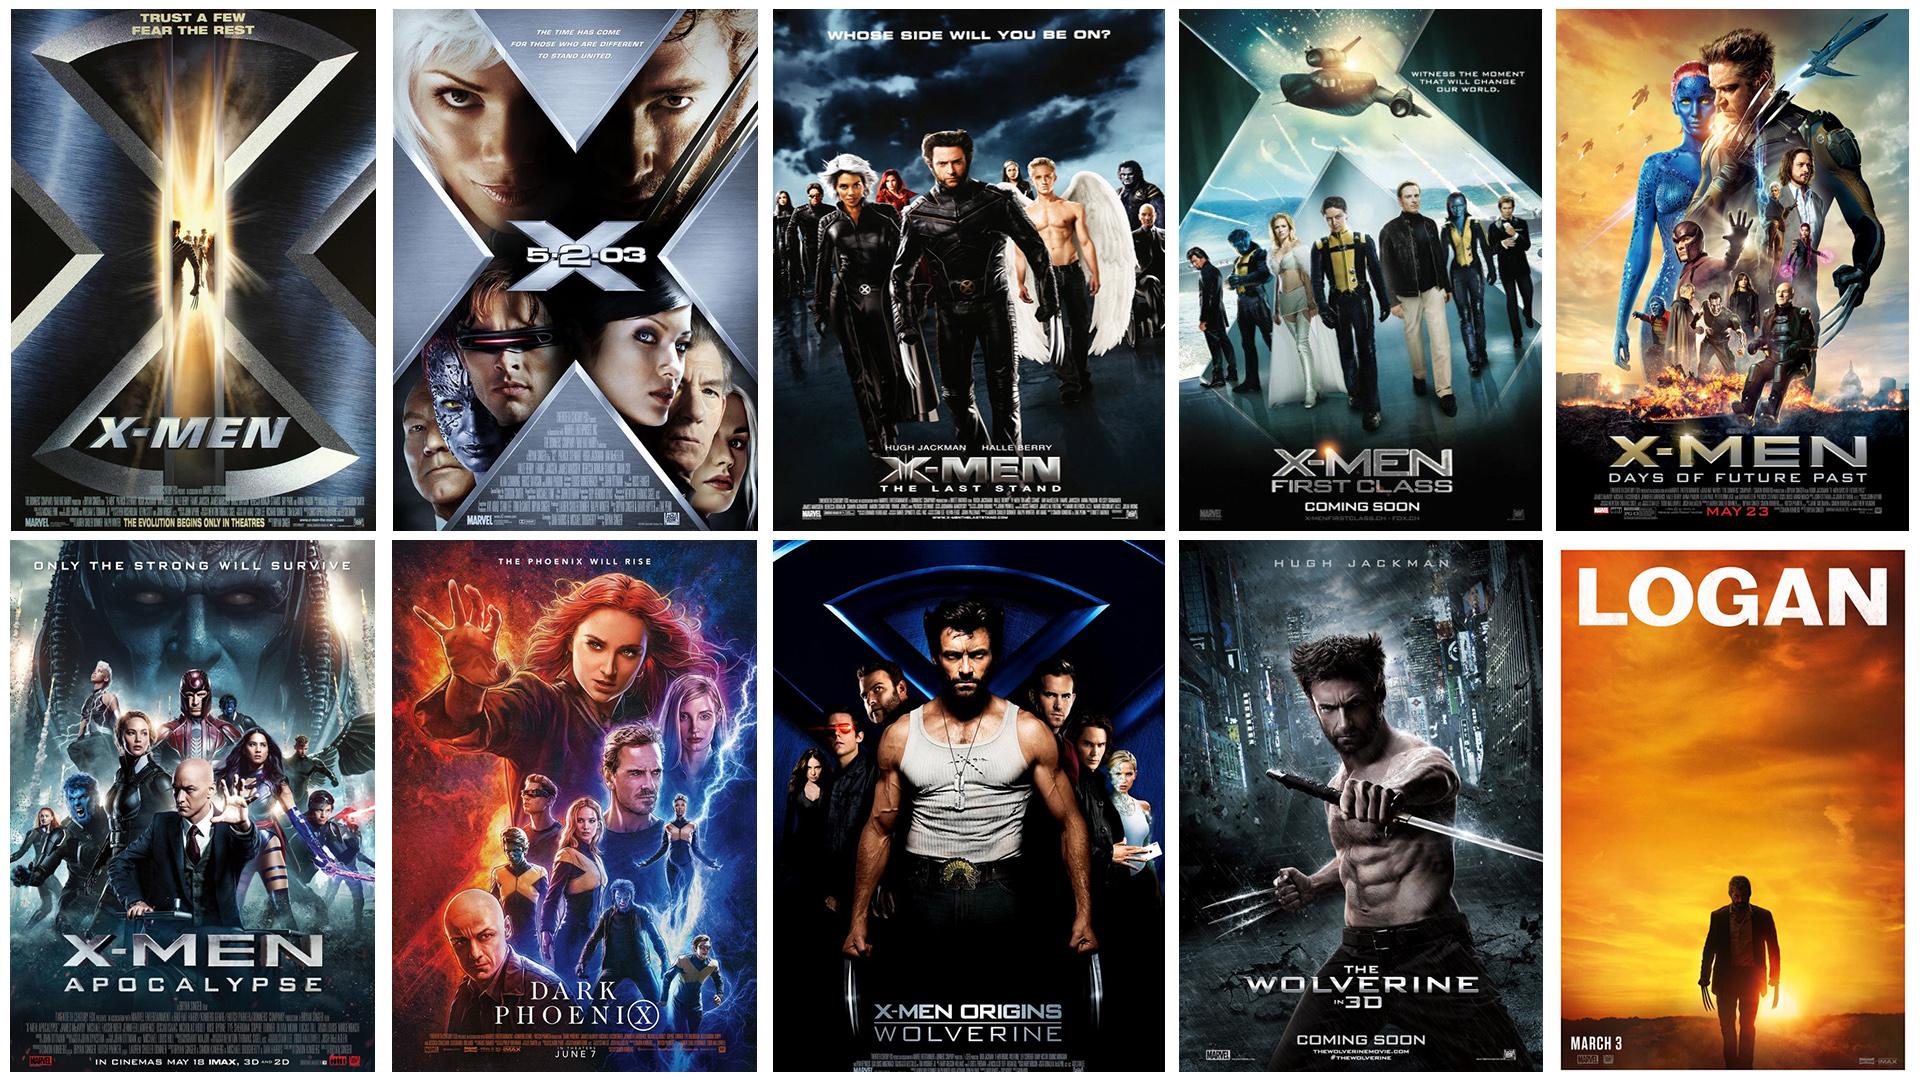 The X-Men Legacy